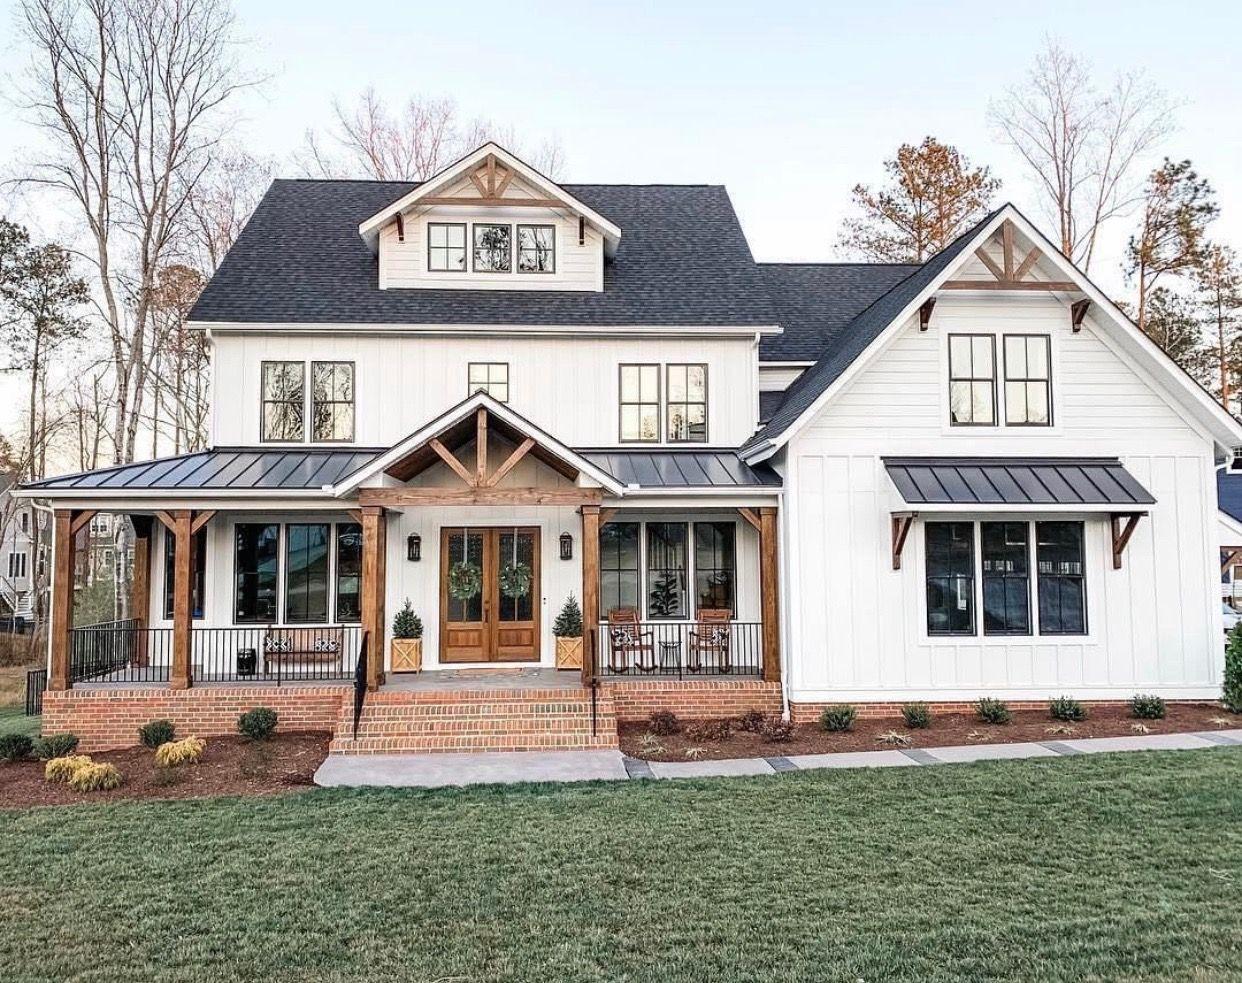 Pin By Jessica Plemons On Farmhouse Love Dream House Exterior House Styles House Exterior